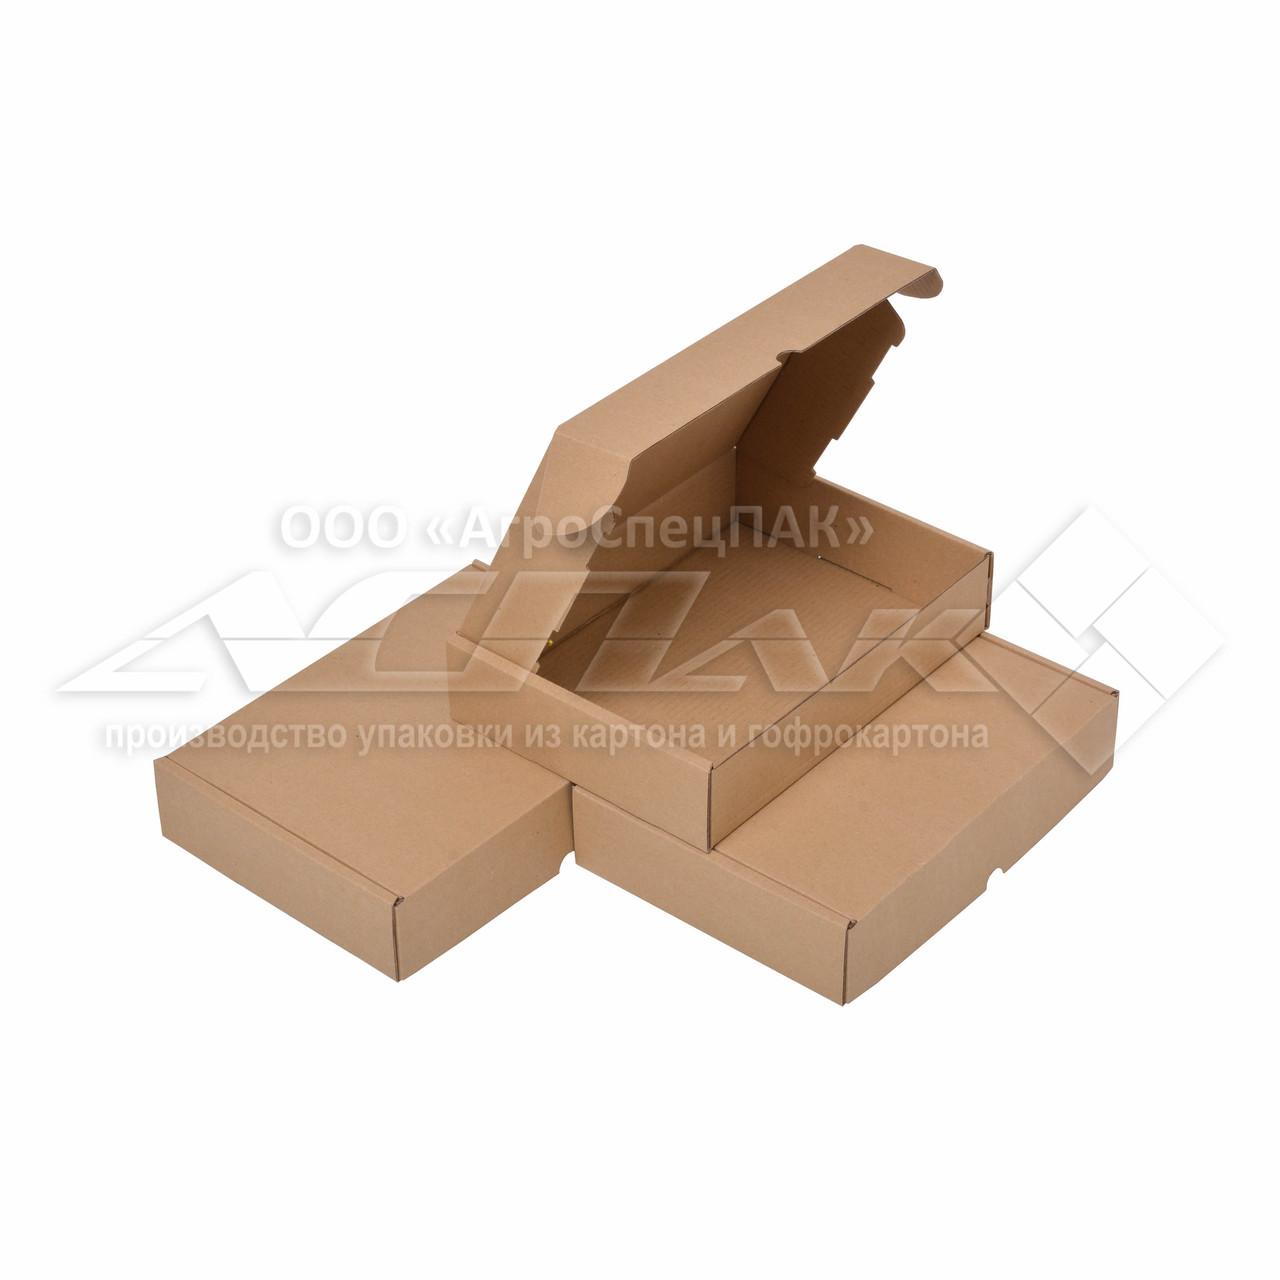 Коробка картонная 24х17х5 (см) 0,5 кг. бурая. Коробки для Новой почты 240 х 170 х 50 мм.